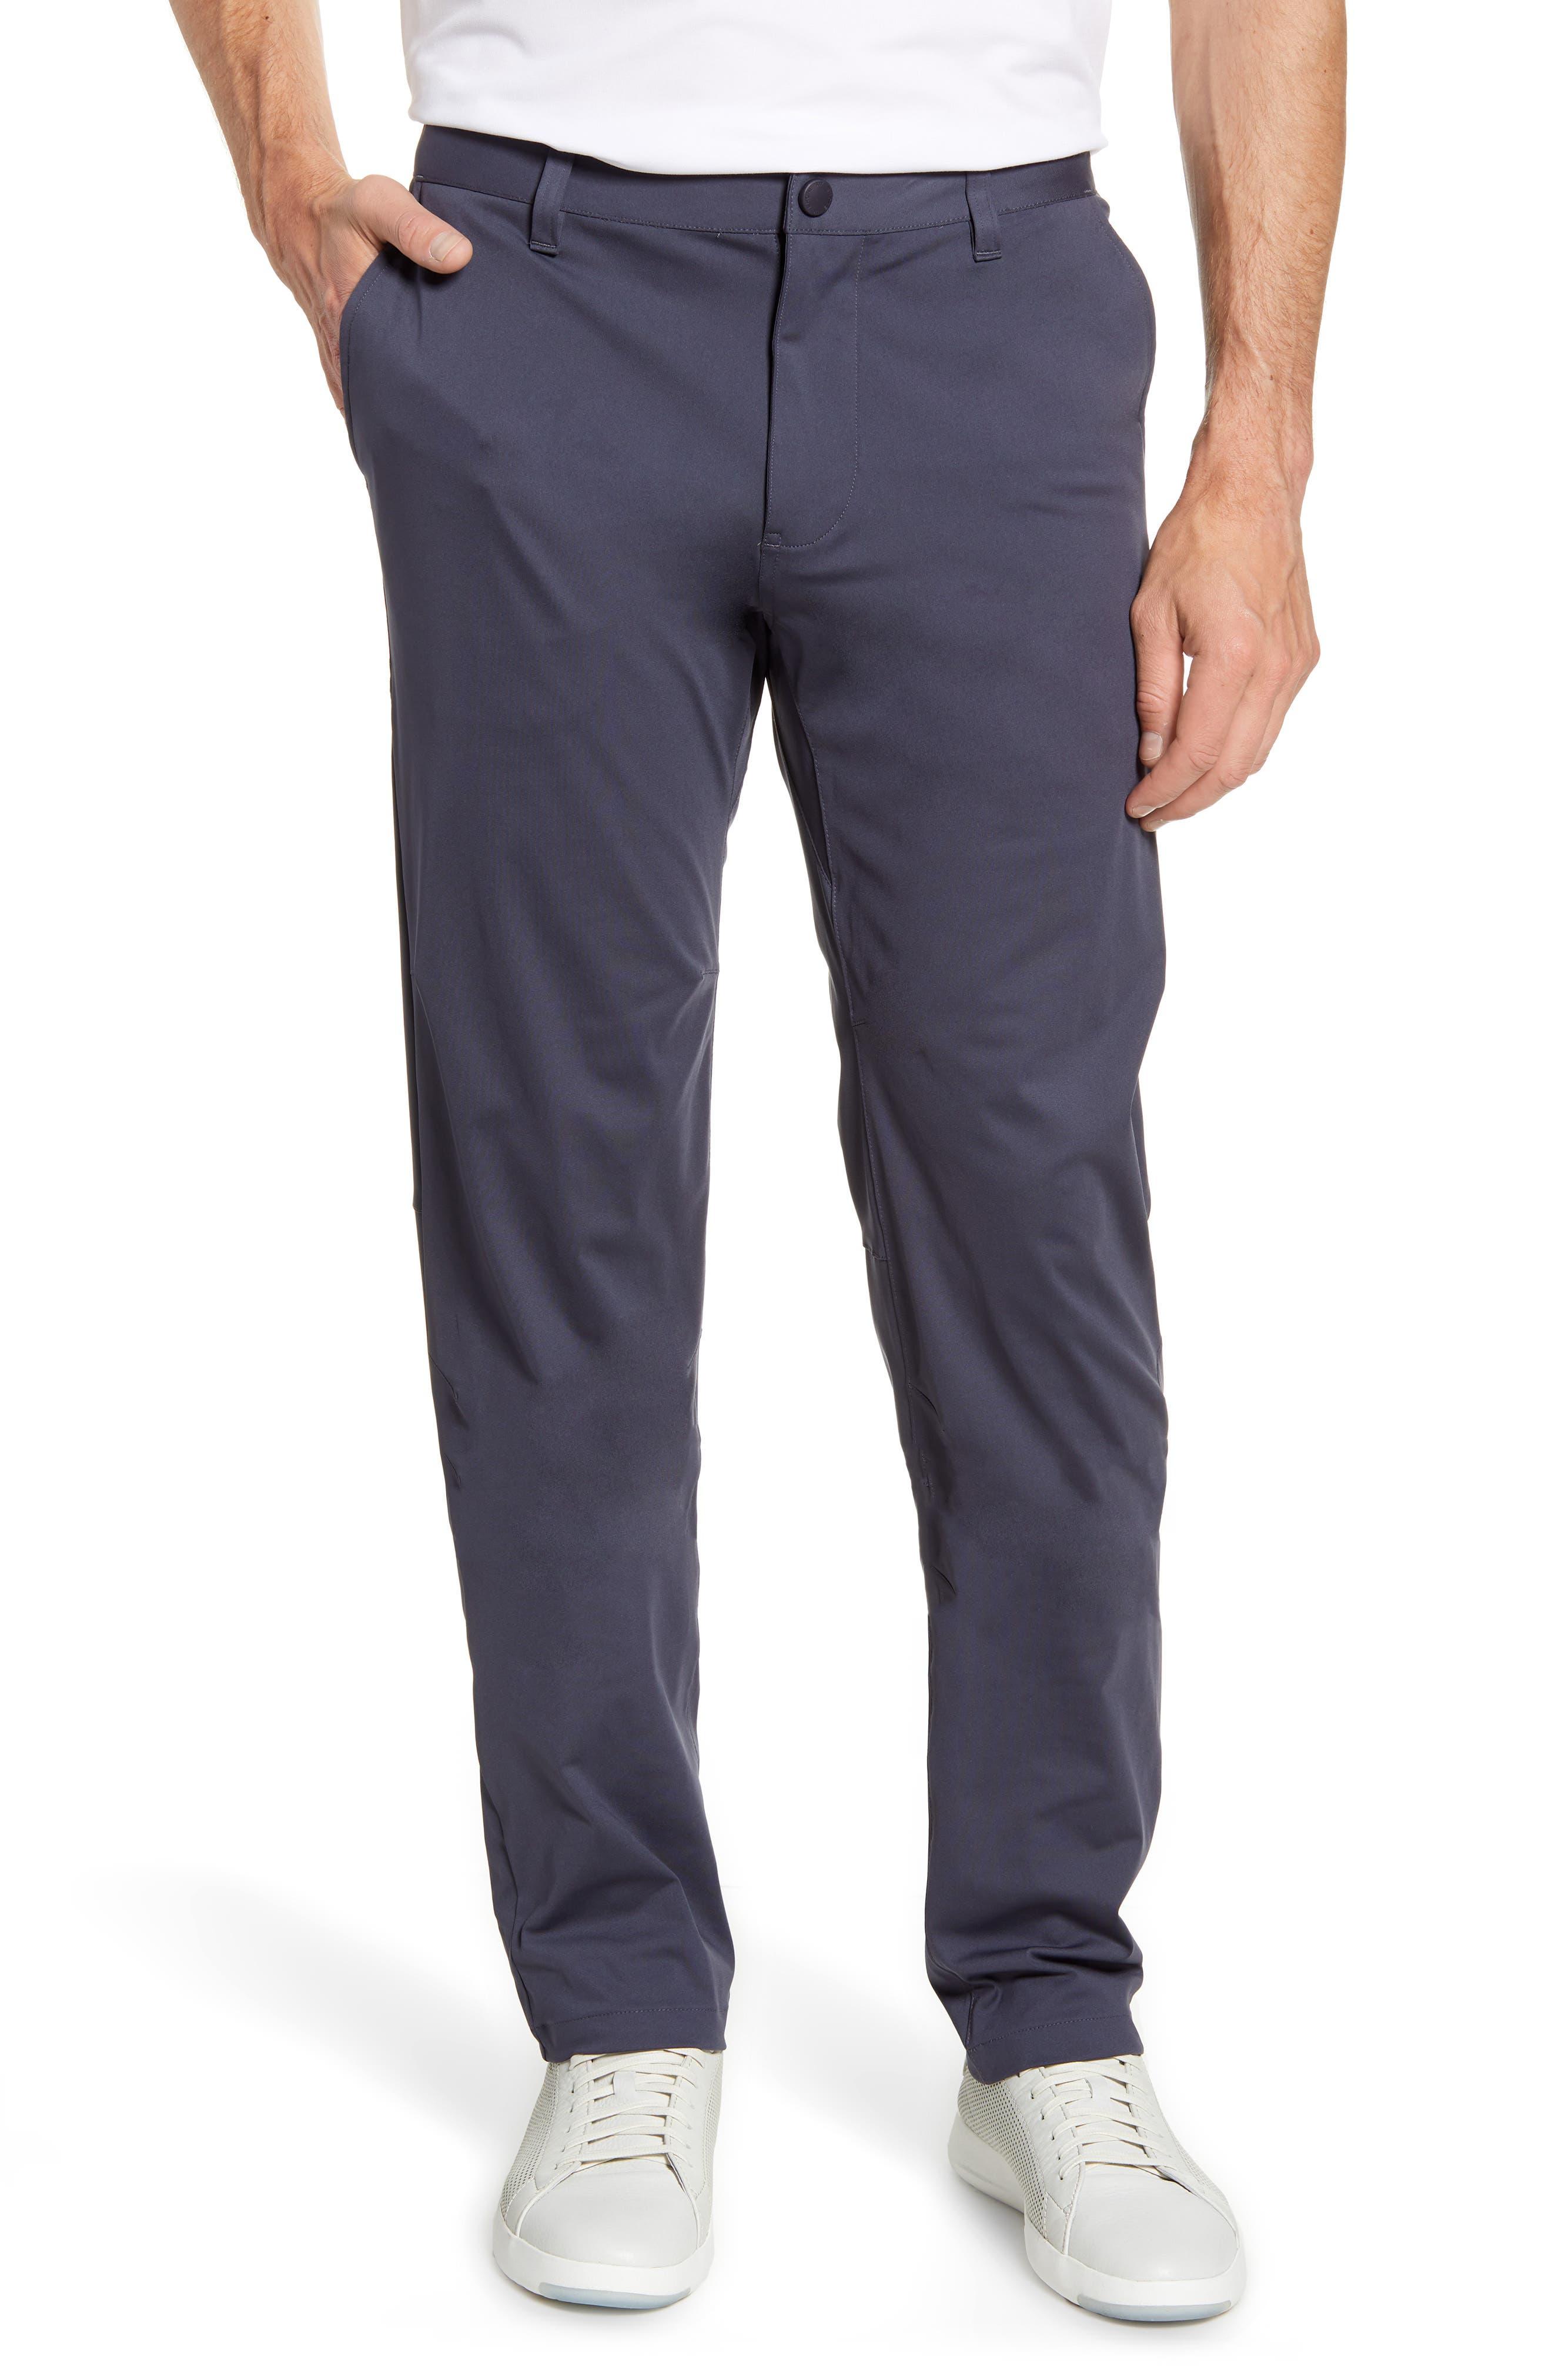 Image of RHONE Commuter Pants